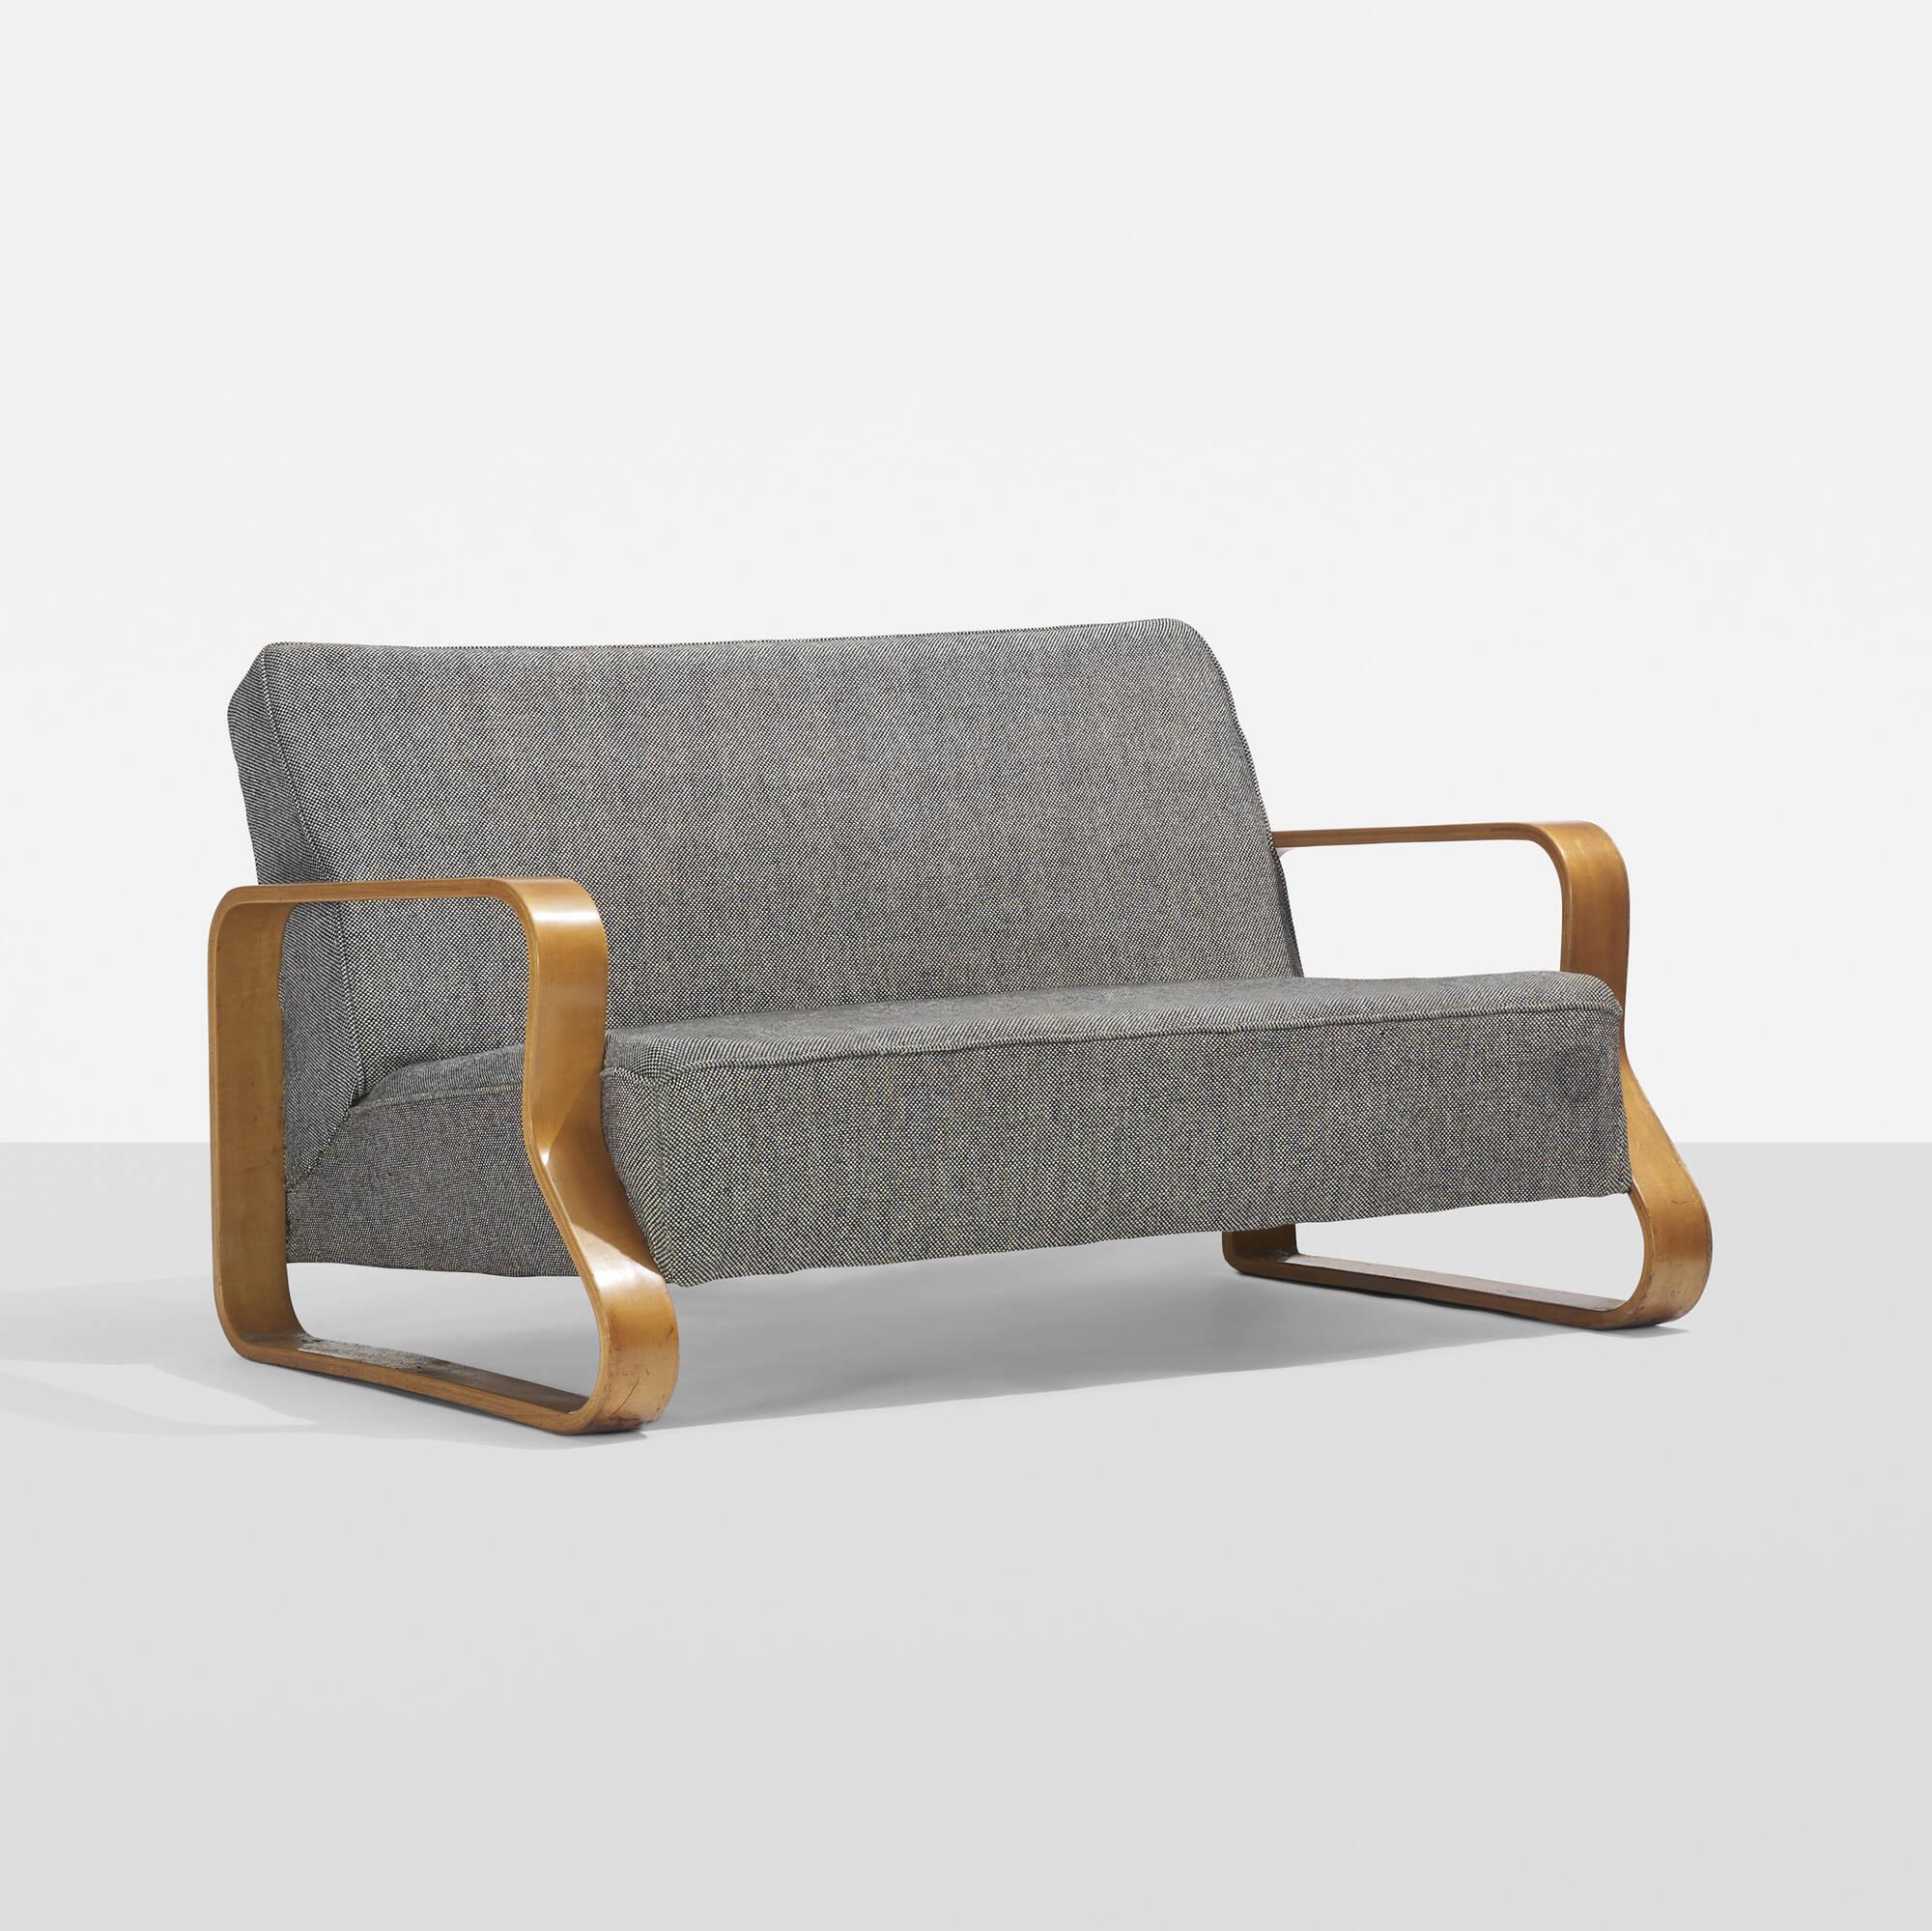 Artek sofa 544 for Sofa bed 549 artek